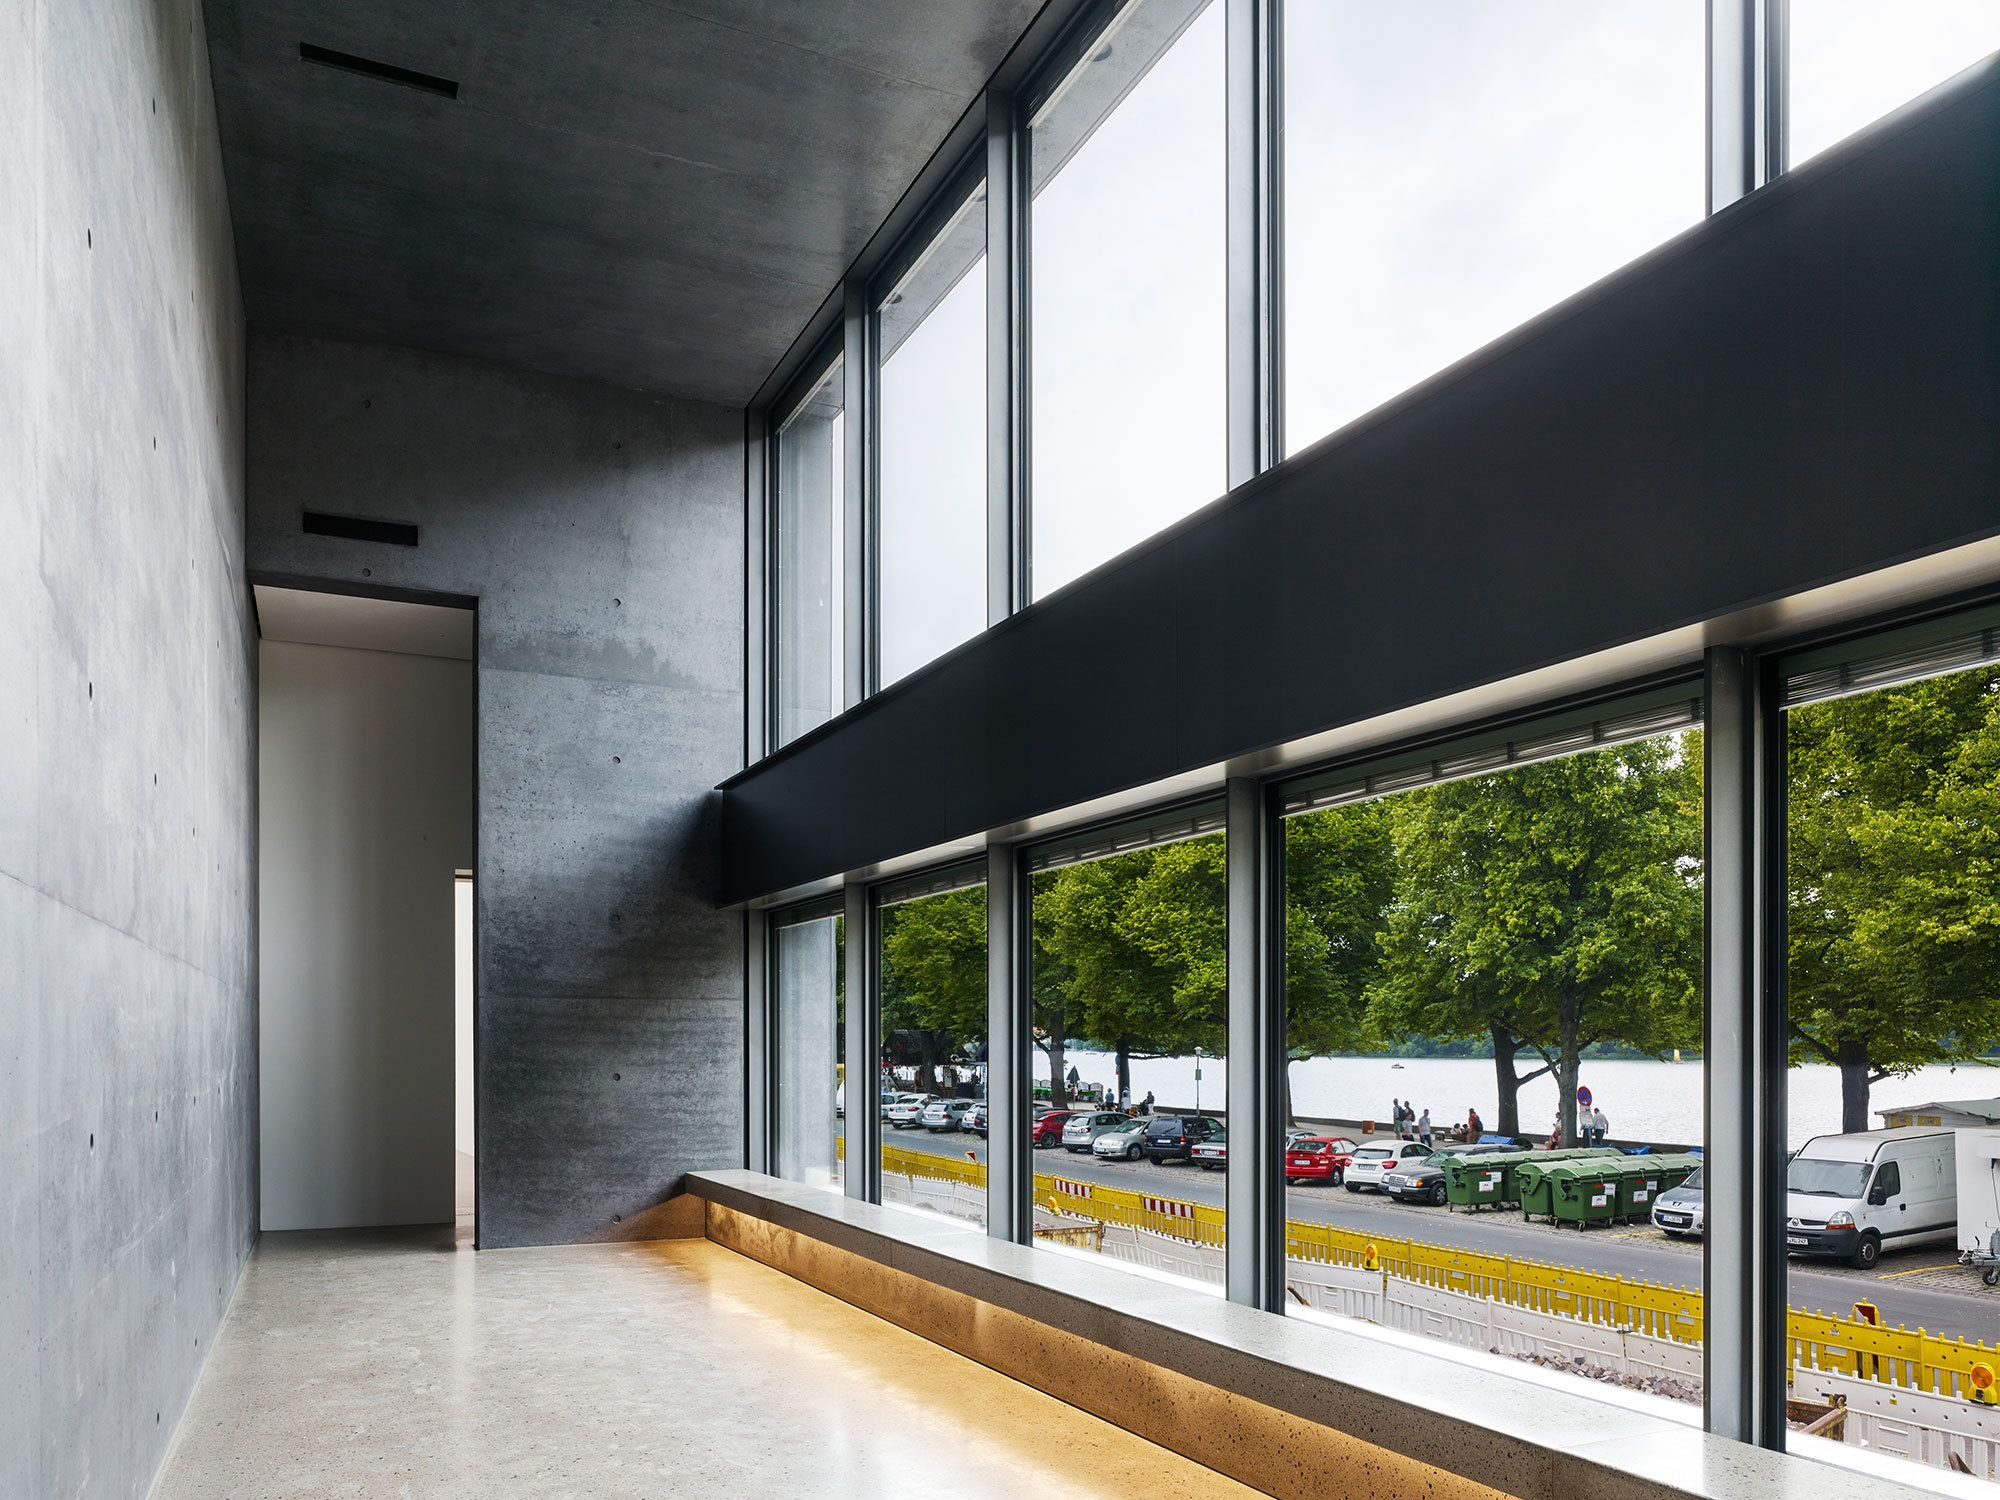 Architekten In Hannover meili architekten sprengel museum hannover 7 a f a s i a